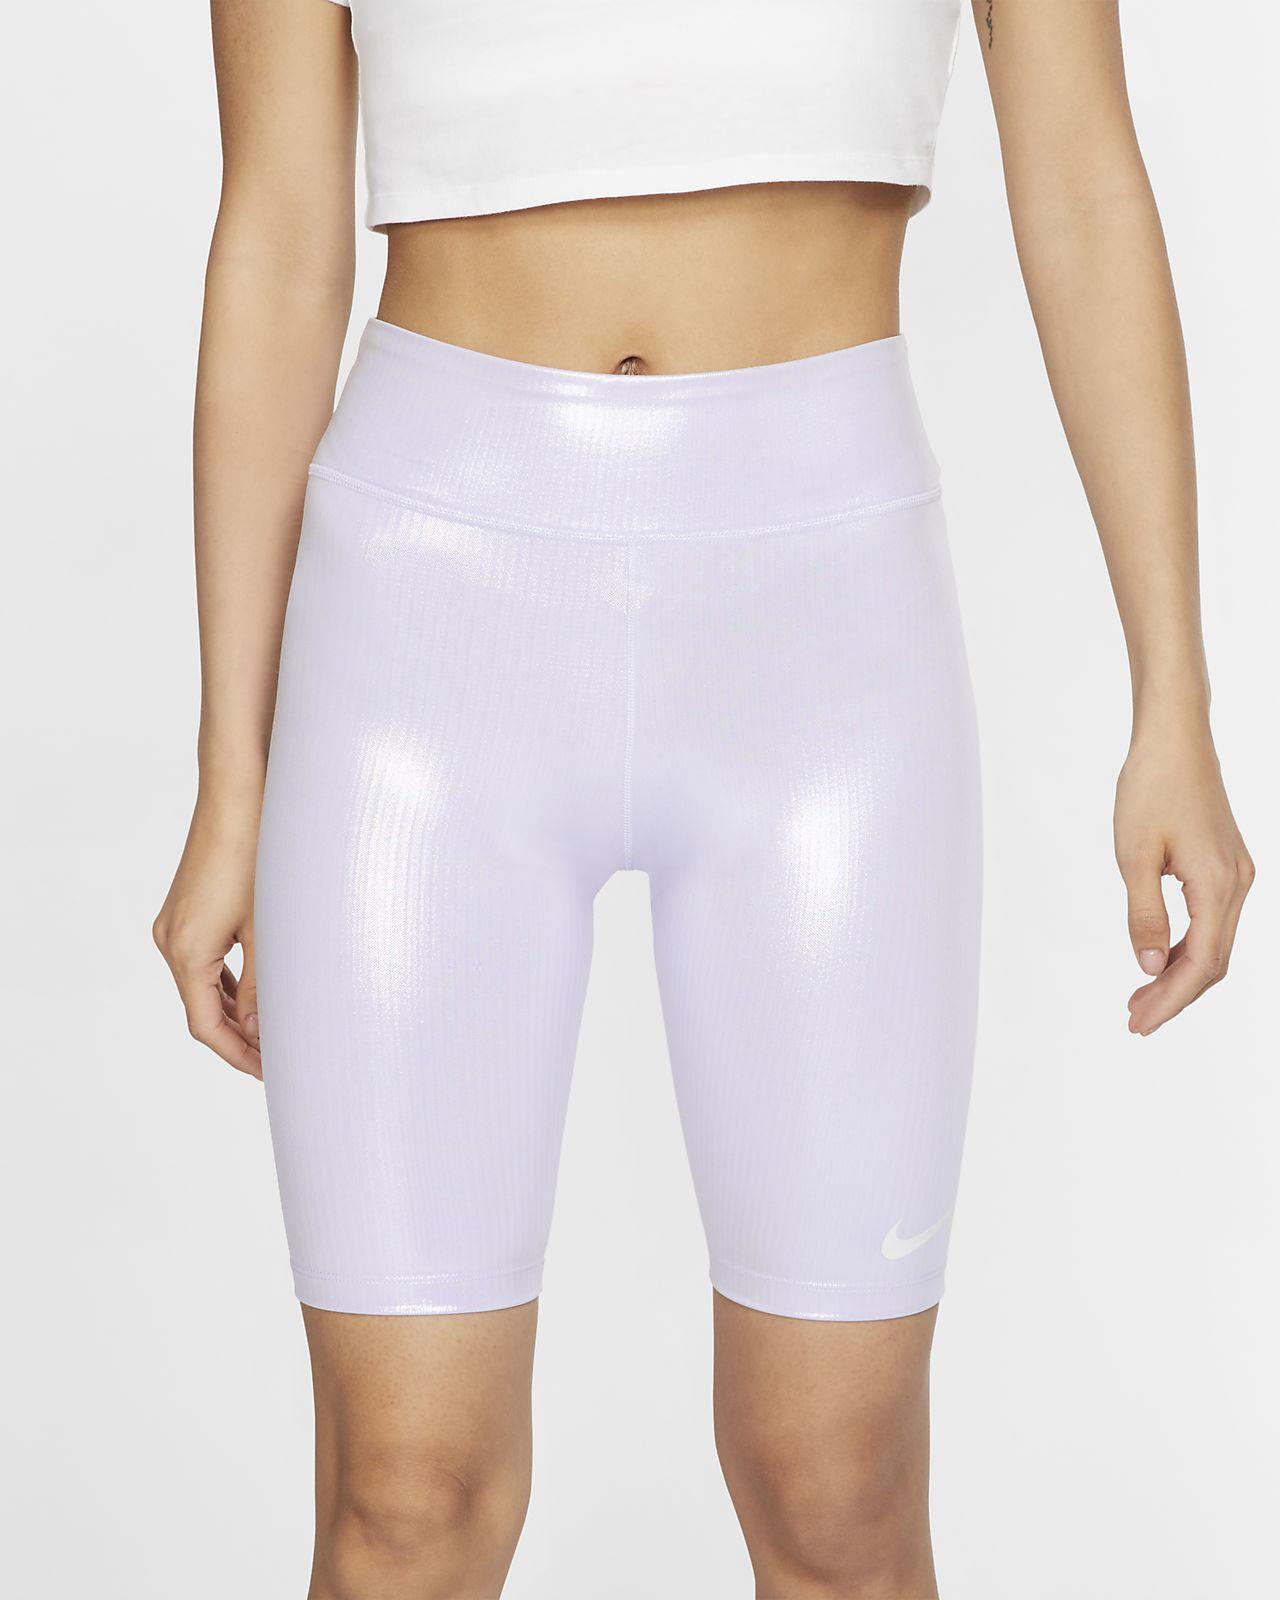 Nike Damen-Radshorts